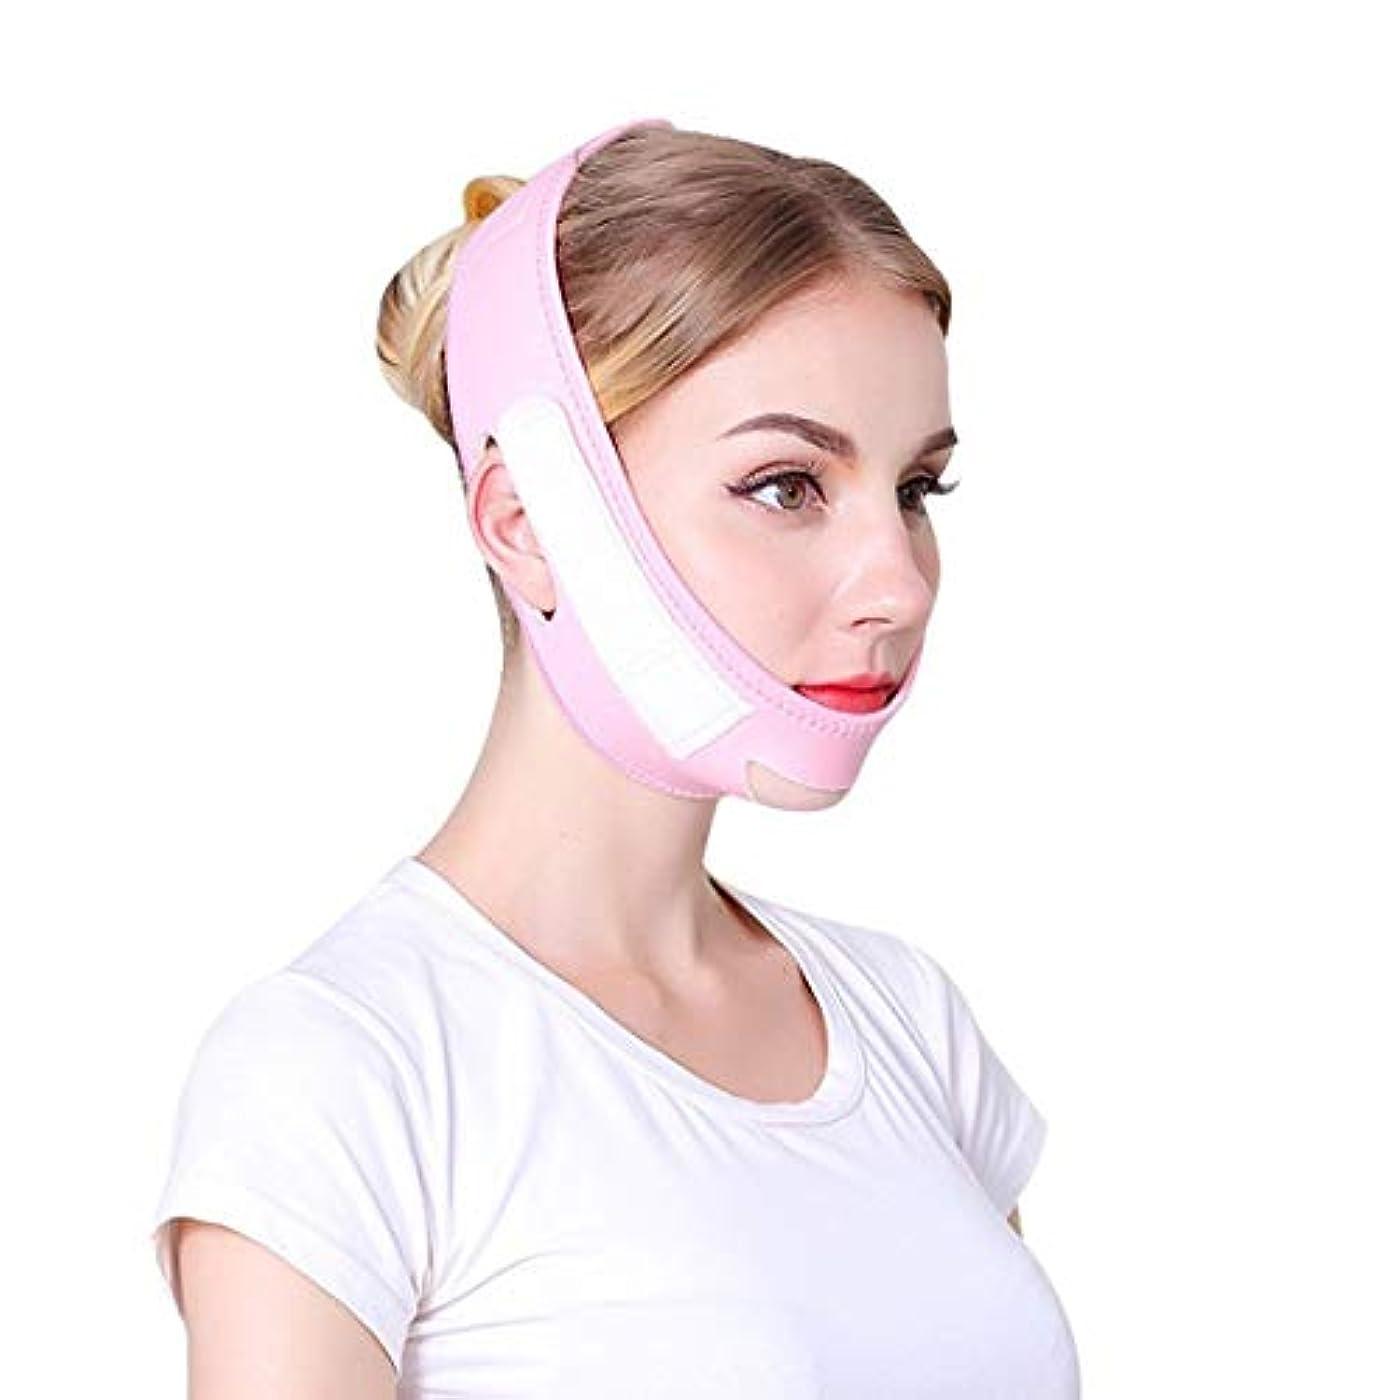 ZWBD フェイスマスク, 痩身Vマスク二重あごケア減量美容ベルト付きフェイスリフティング包帯顔の減量マスクリフティングフェイス